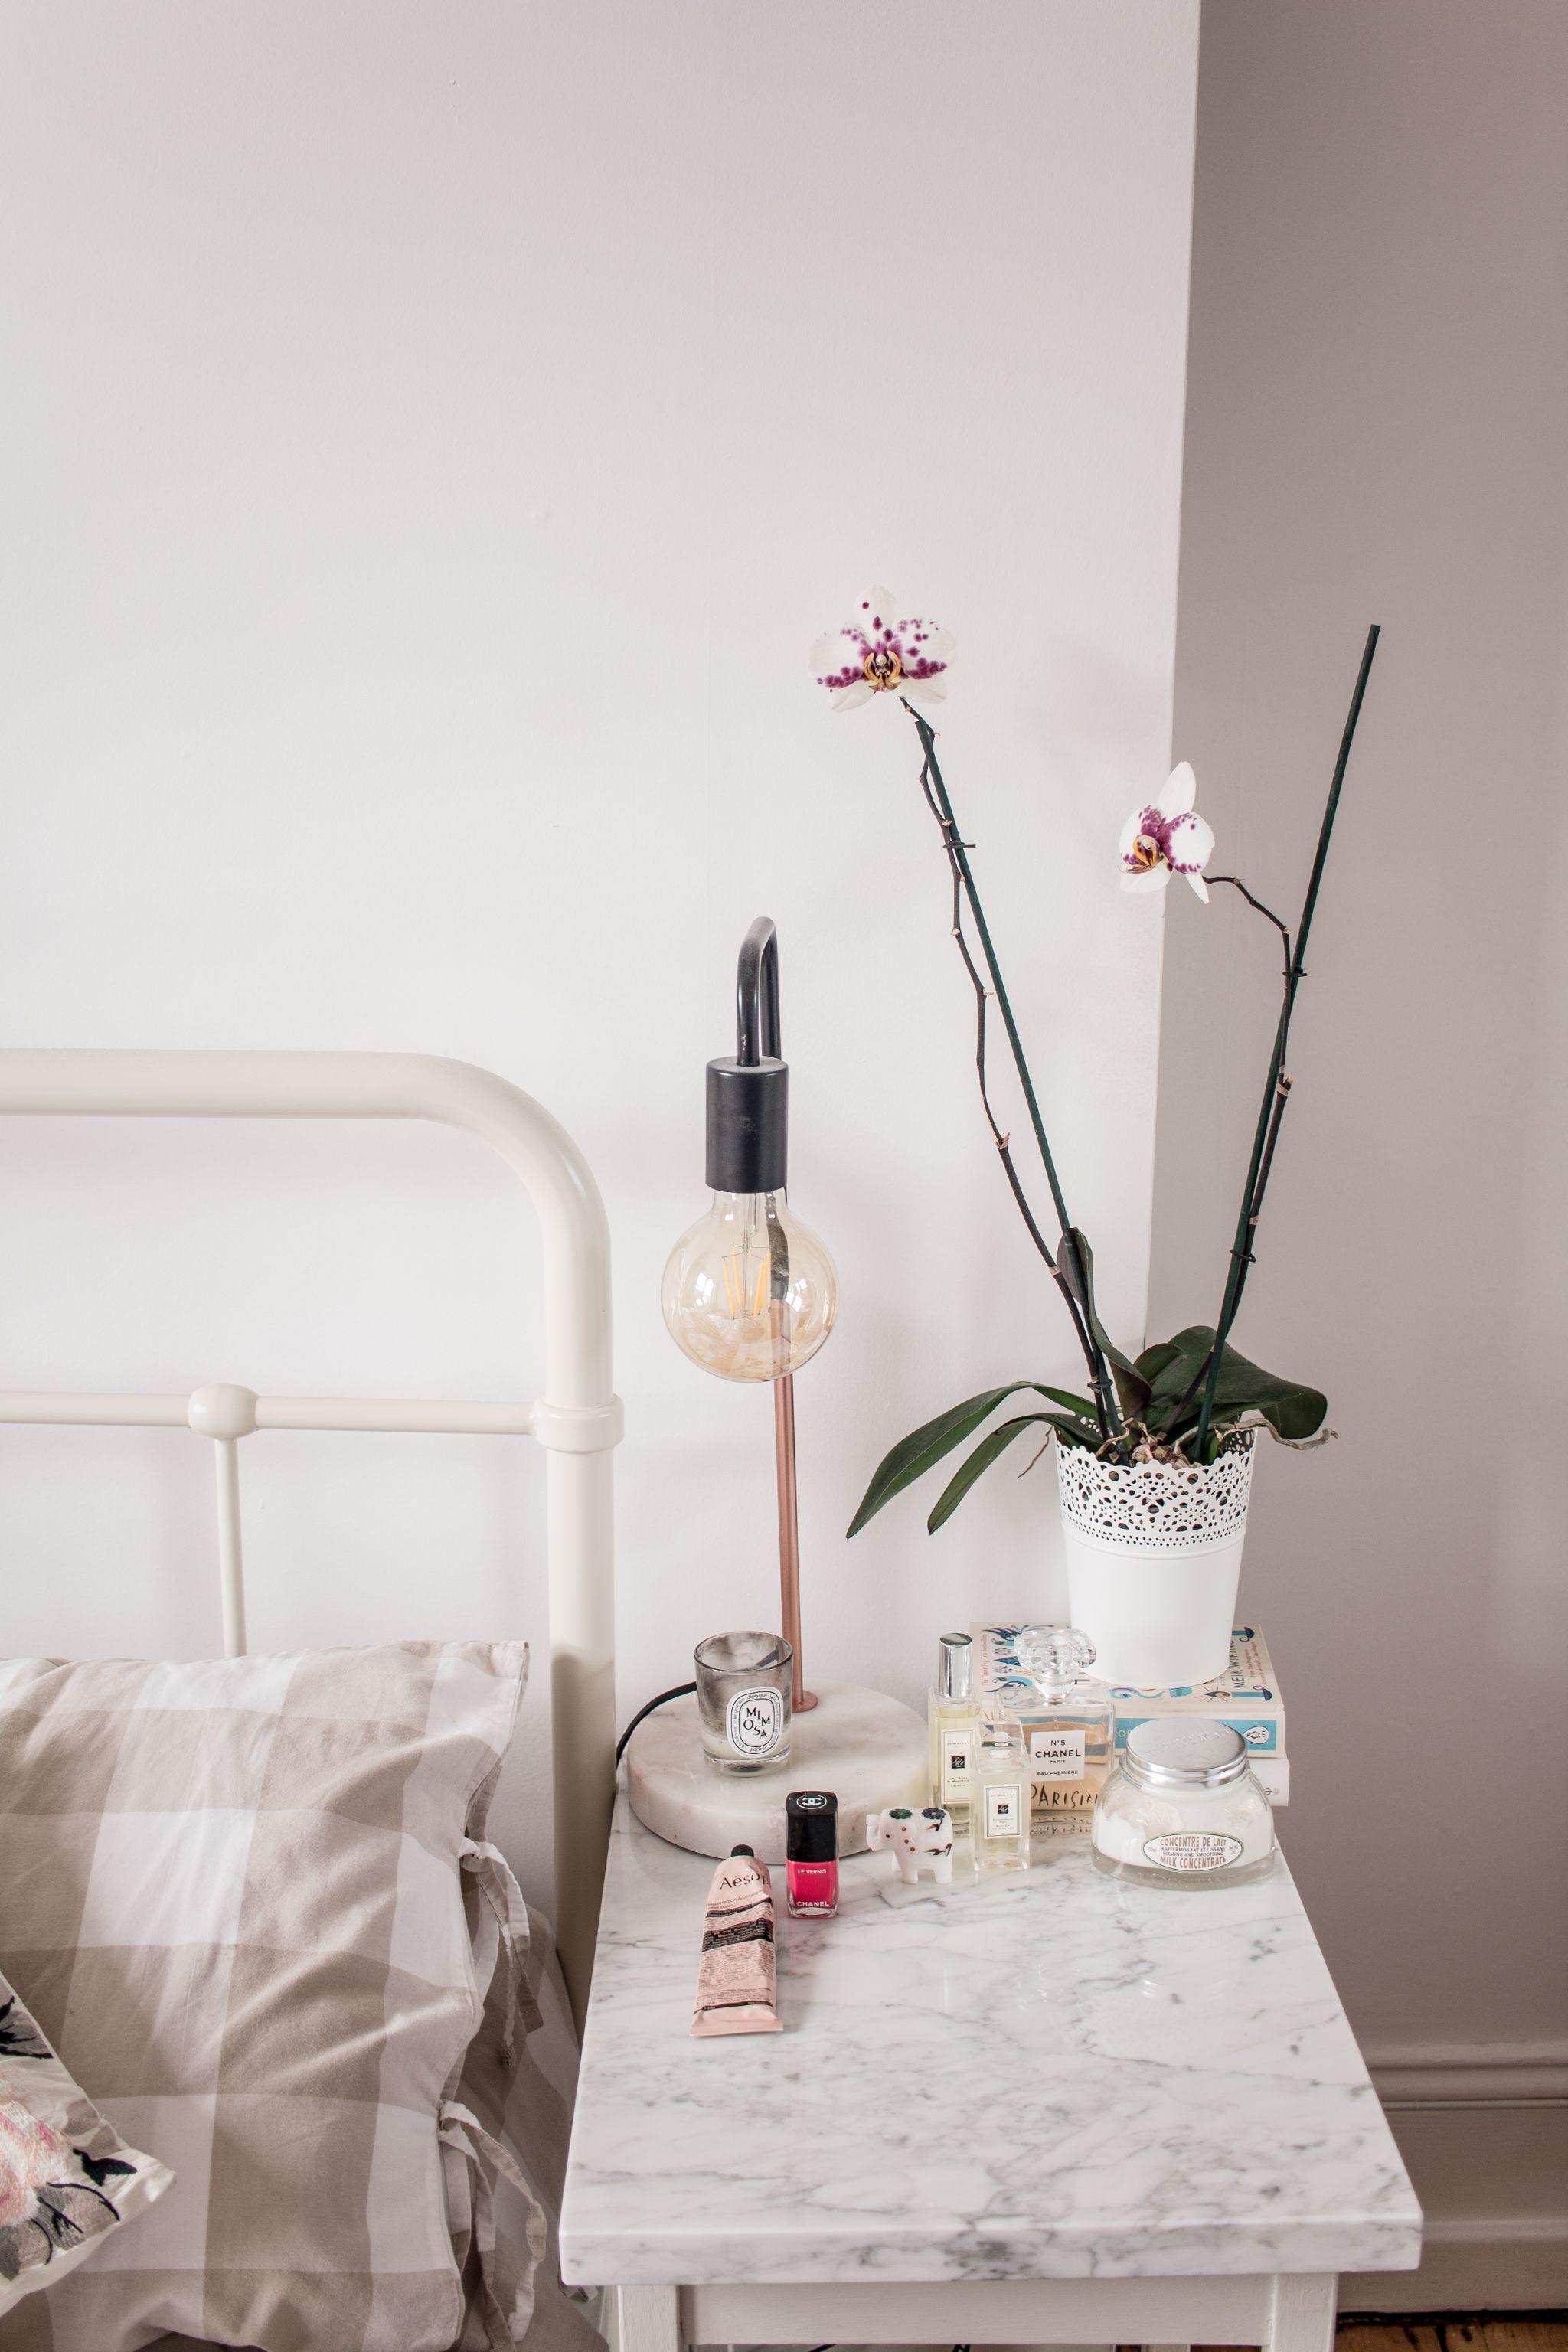 minimal-bedroom-bedside-table-styling-ideas